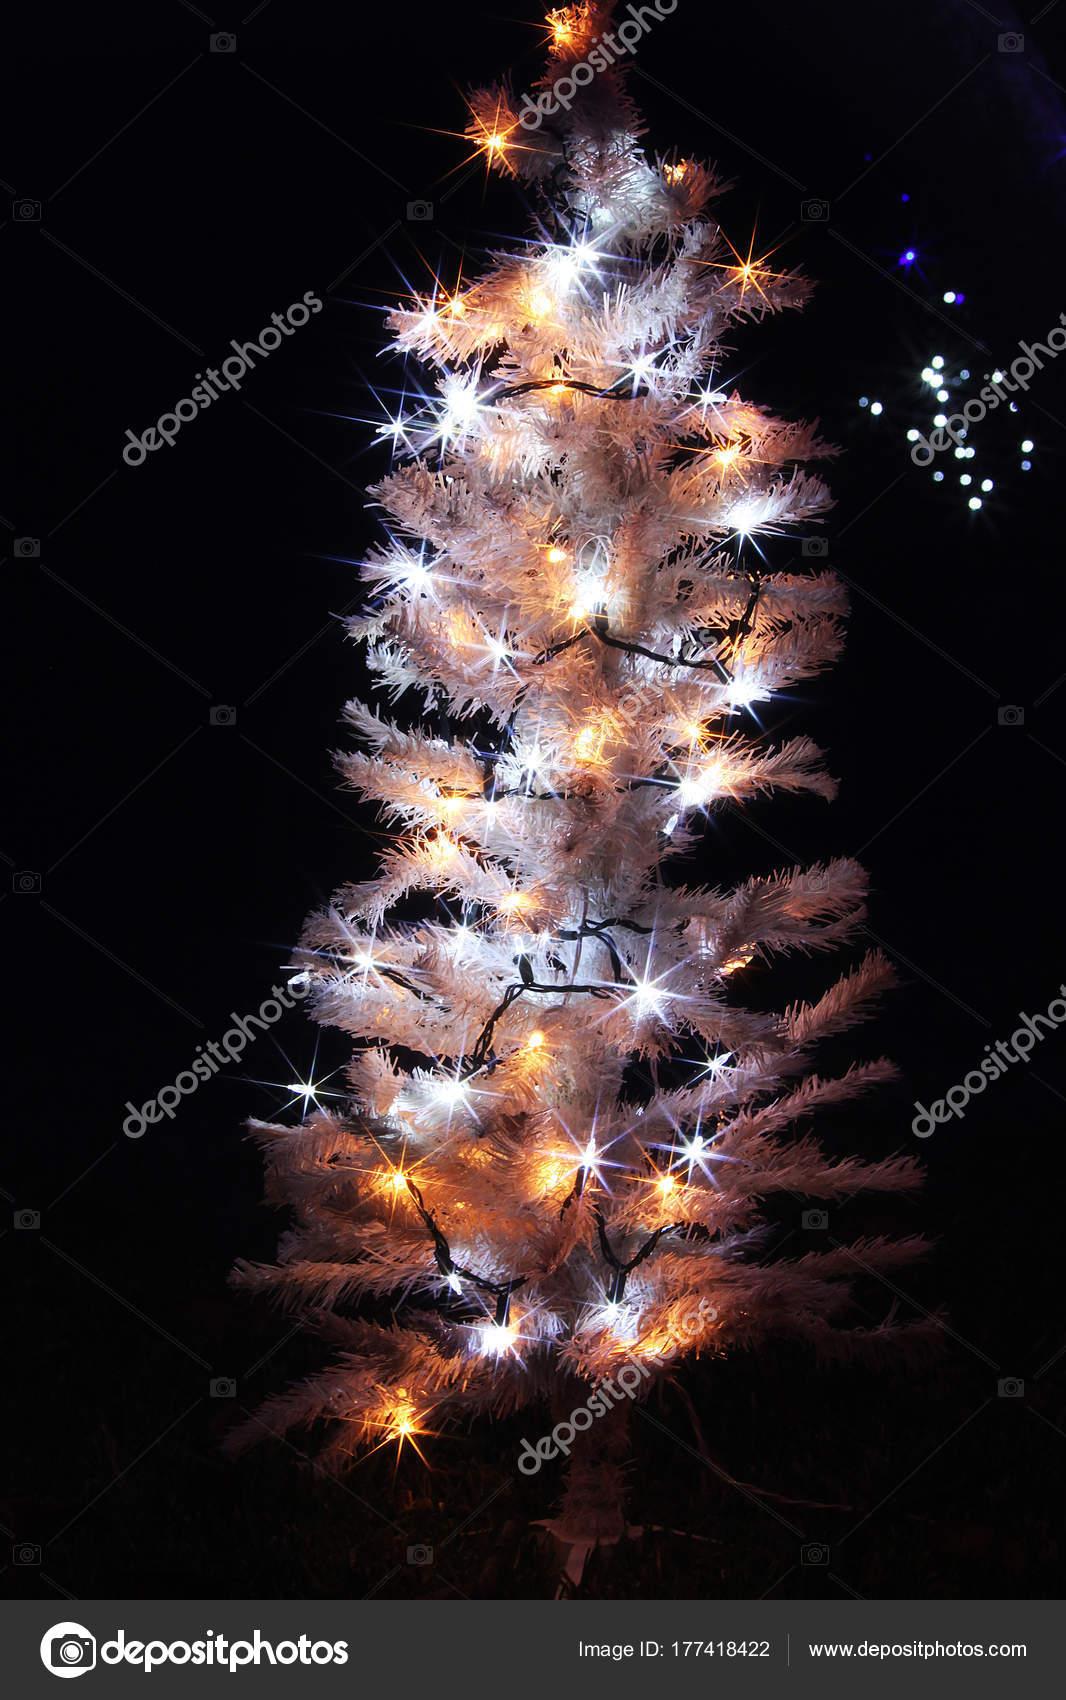 Amerikanische Weihnachtsbeleuchtung.Weihnachtsbeleuchtung Amerika Stockfoto Viktor2013 177418422